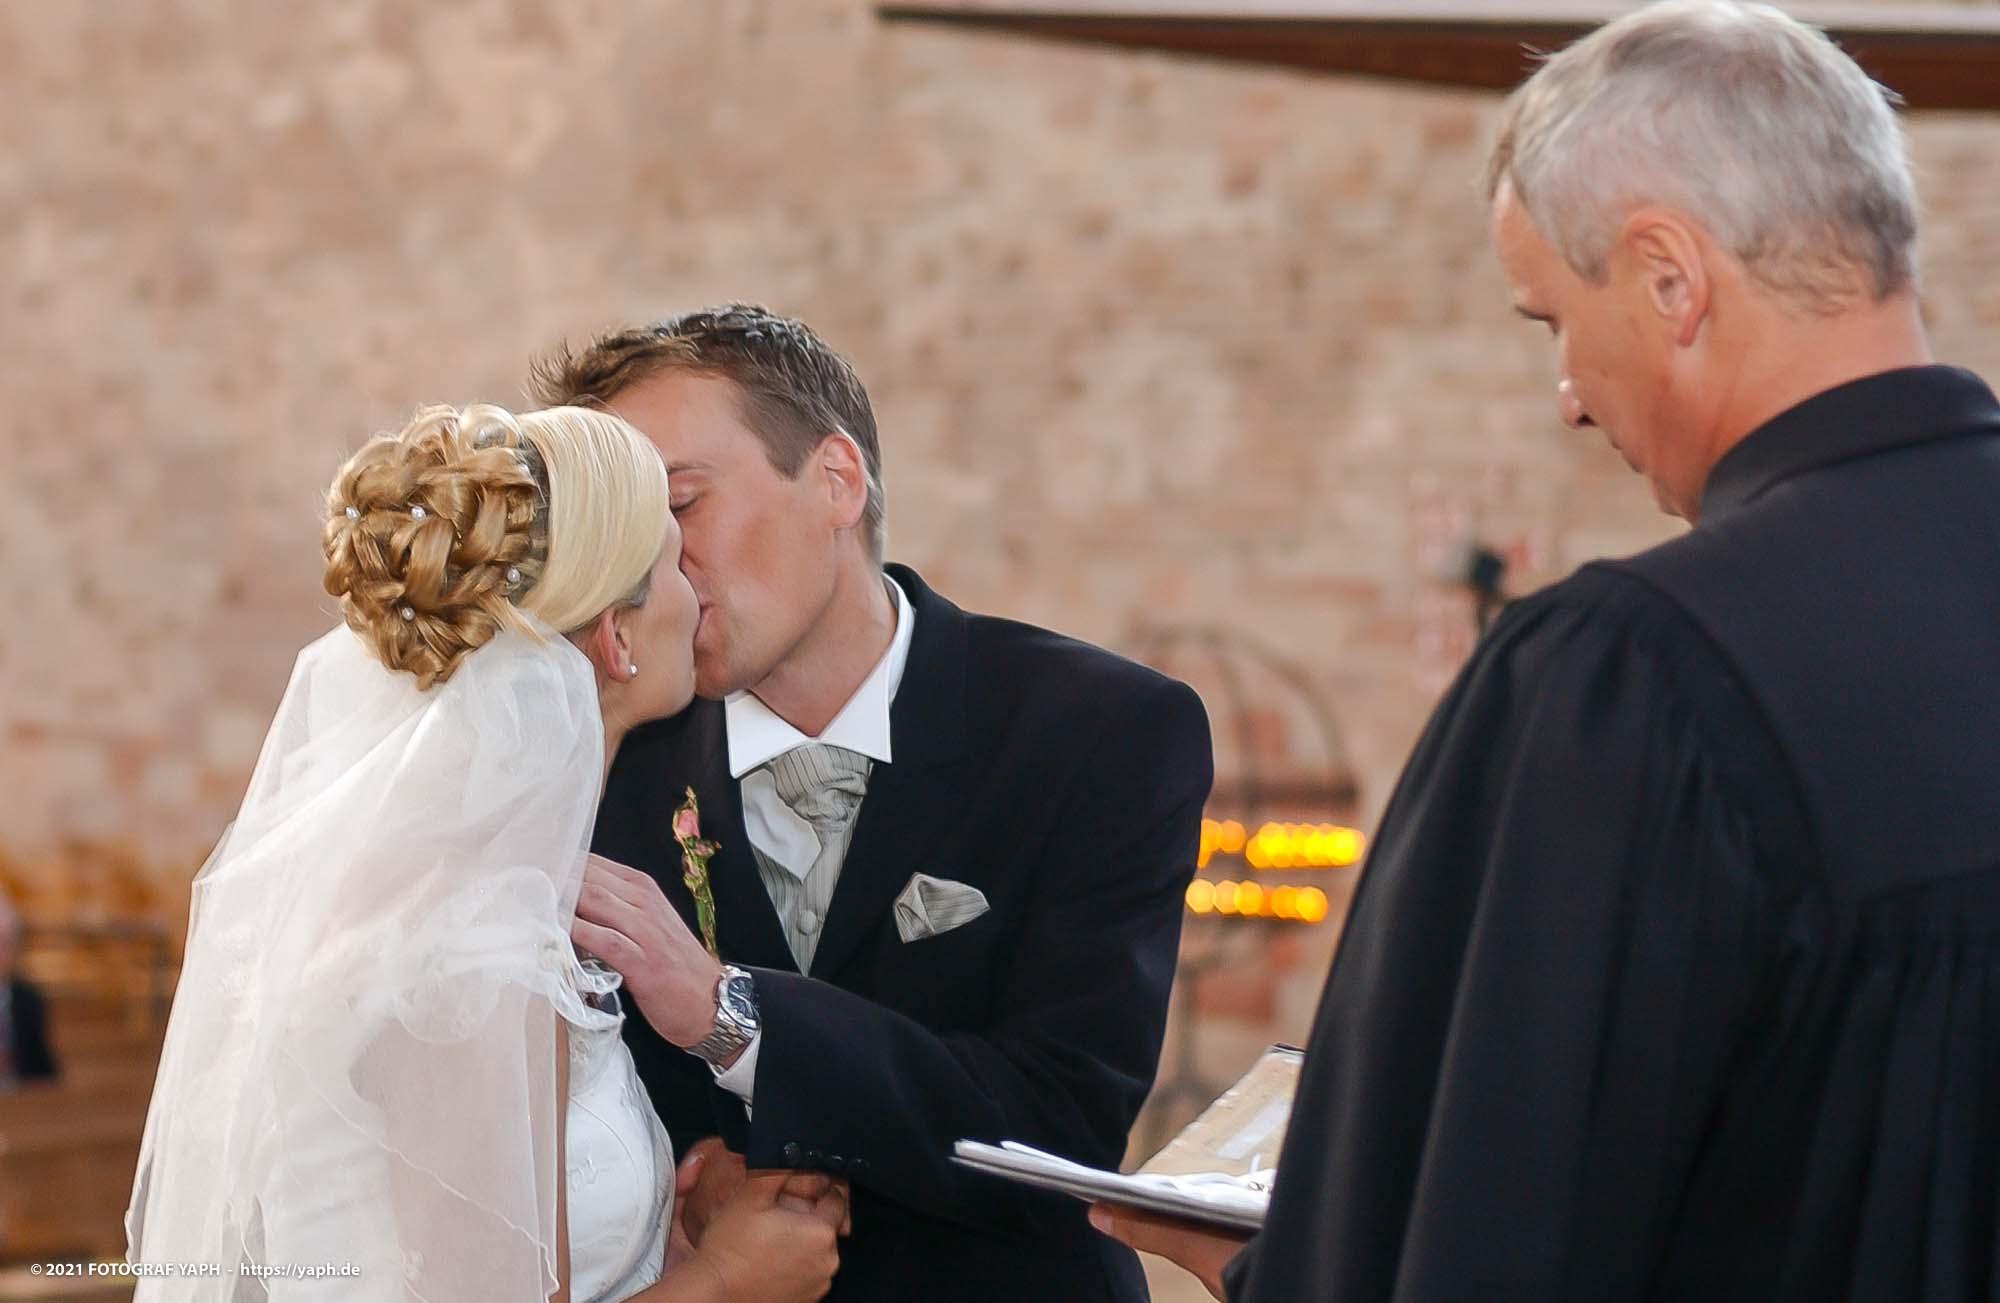 Hochzeitsfotograf Trier - Yaph - Hochzeitsfotos Nina & Lars